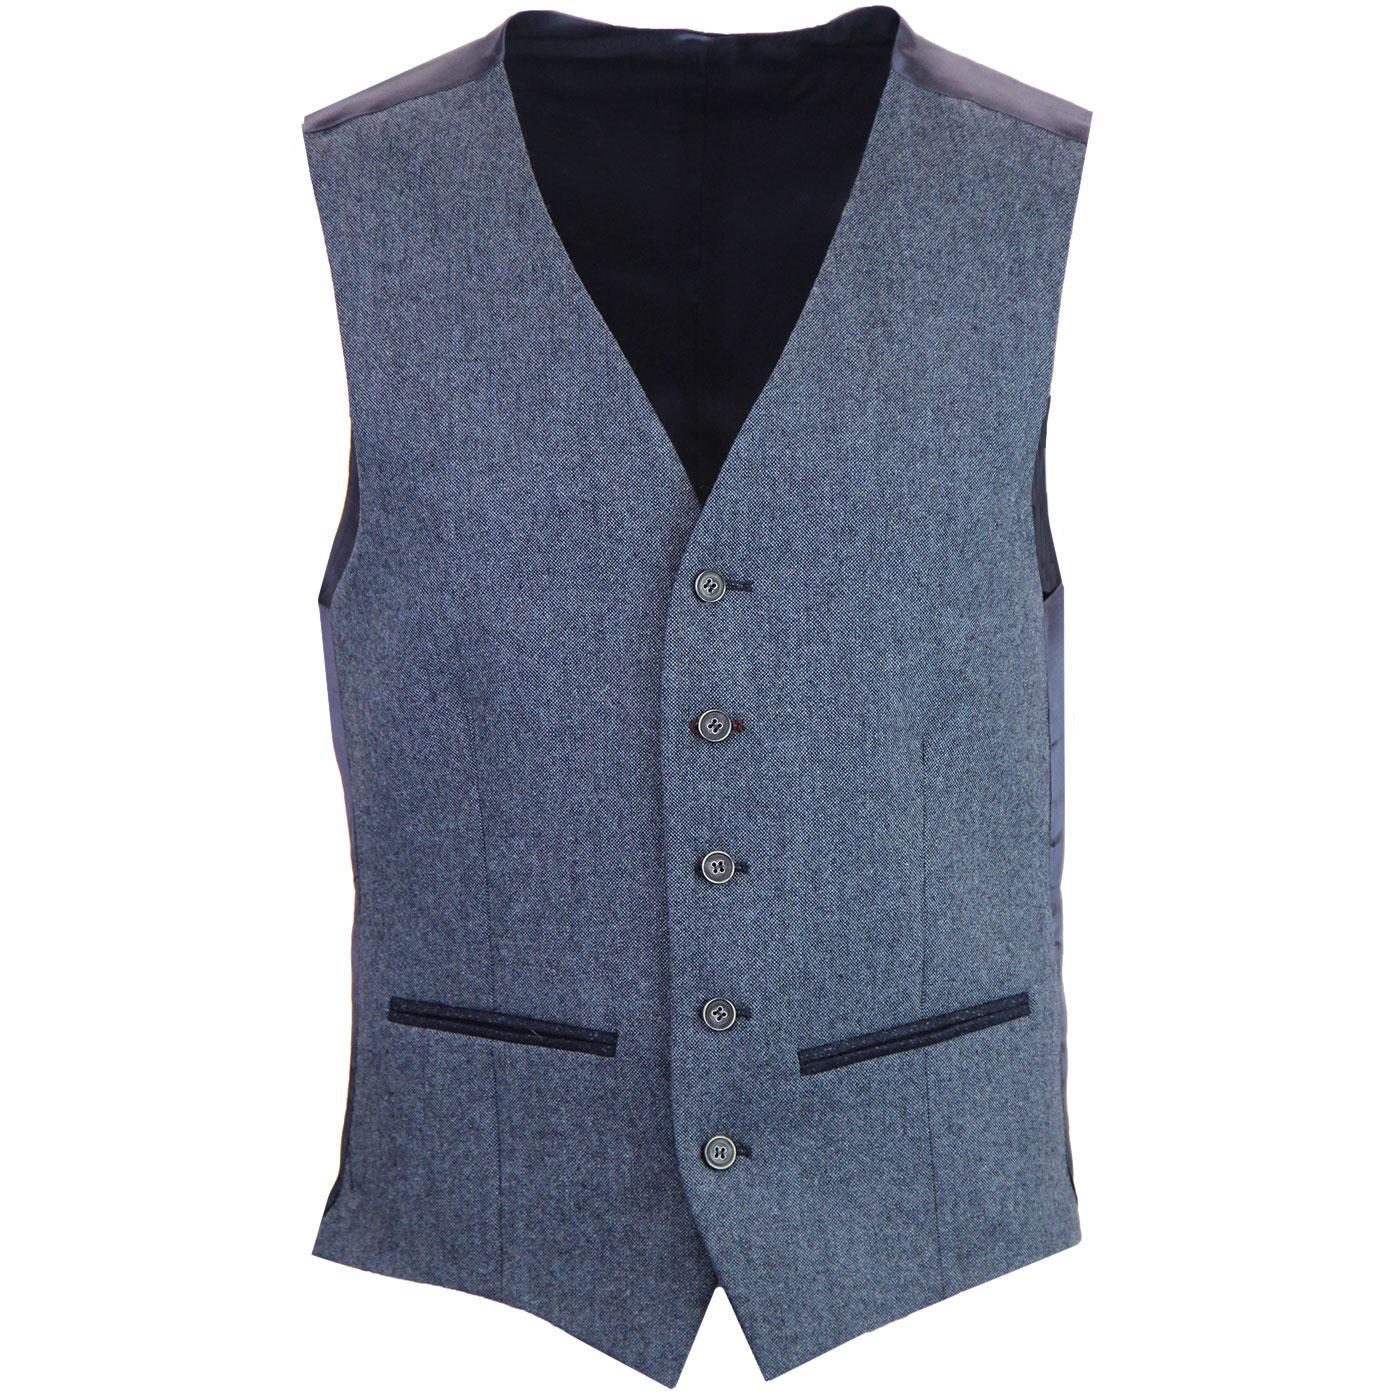 Men's Mod 5 Button V-Neck Blue Donegal Waistcoat